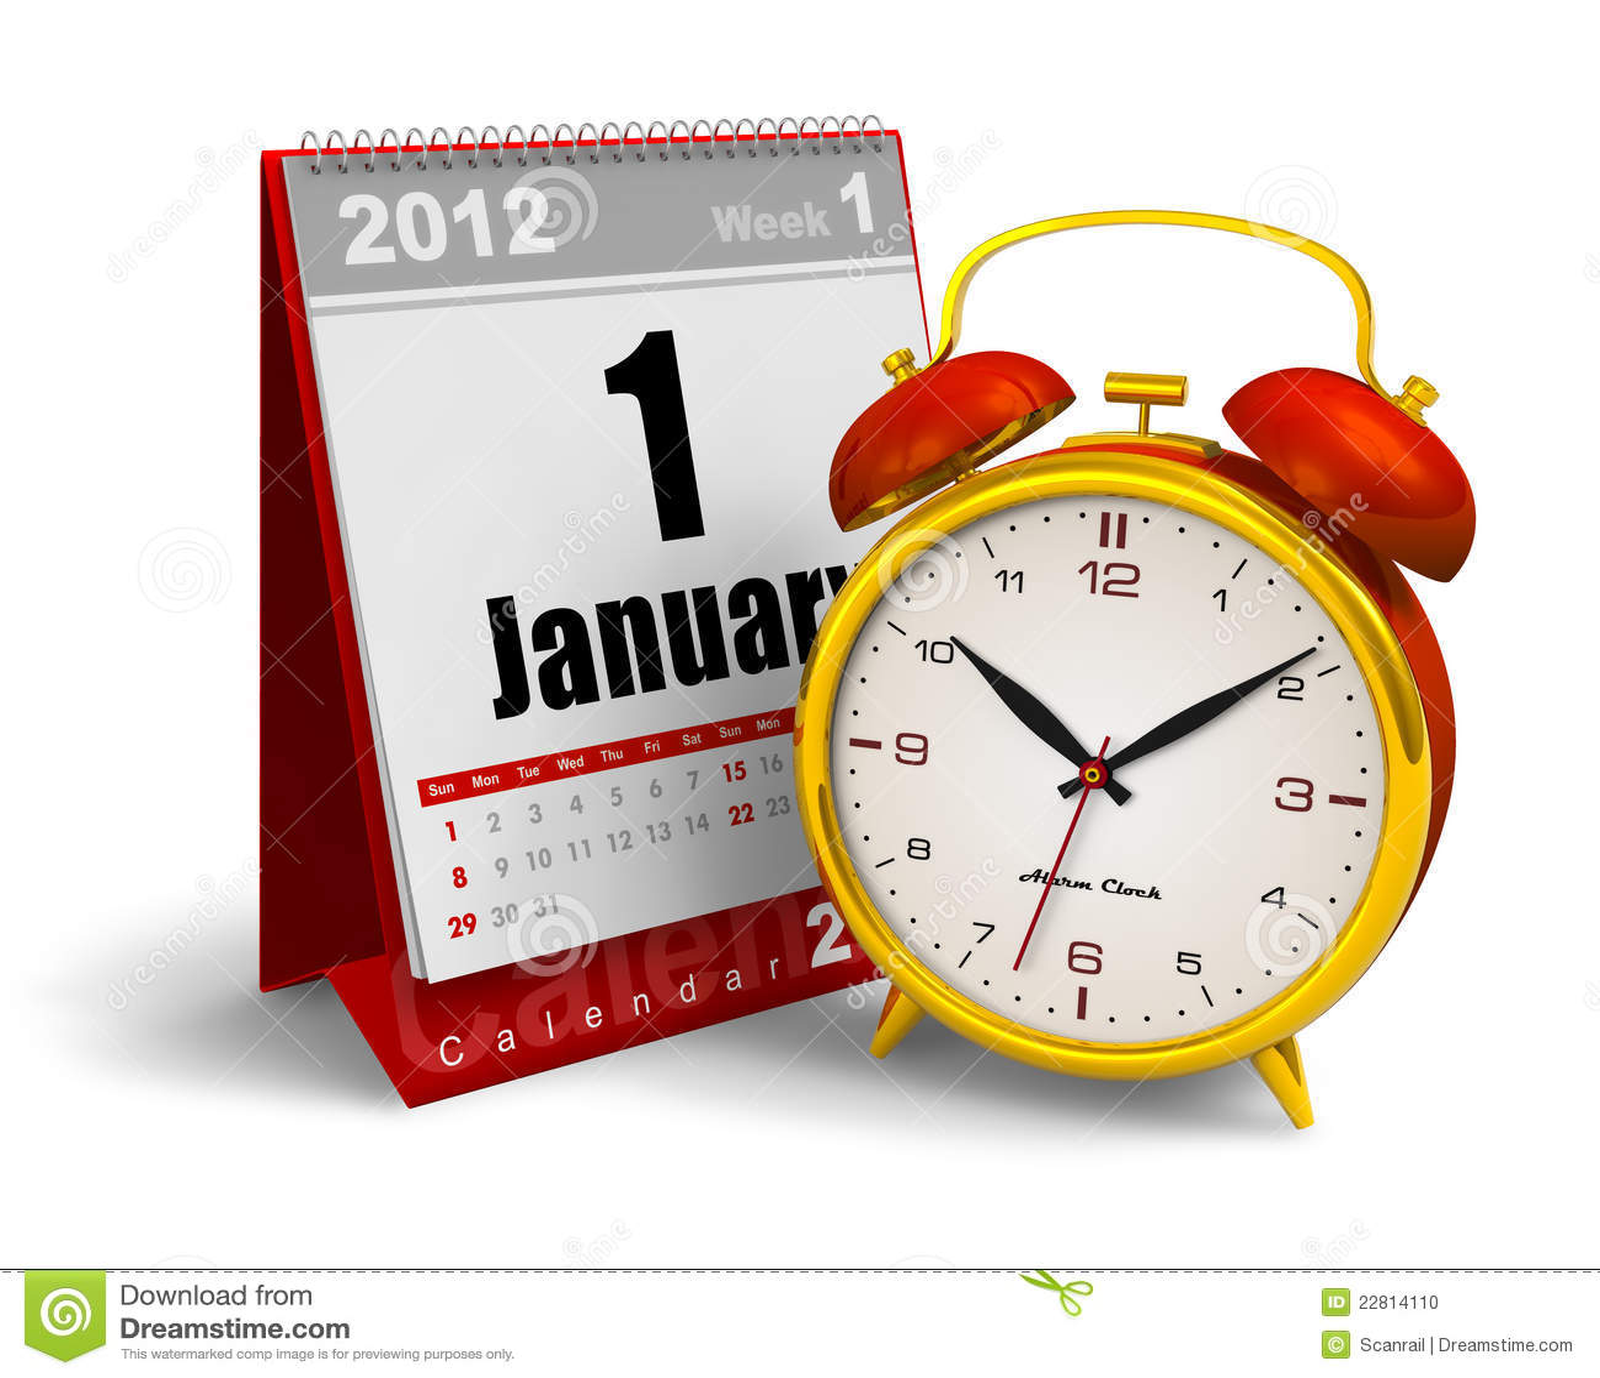 Calendar Clock Wallpaper For Desktop : Desktop calendar and alarm clock stock photo image